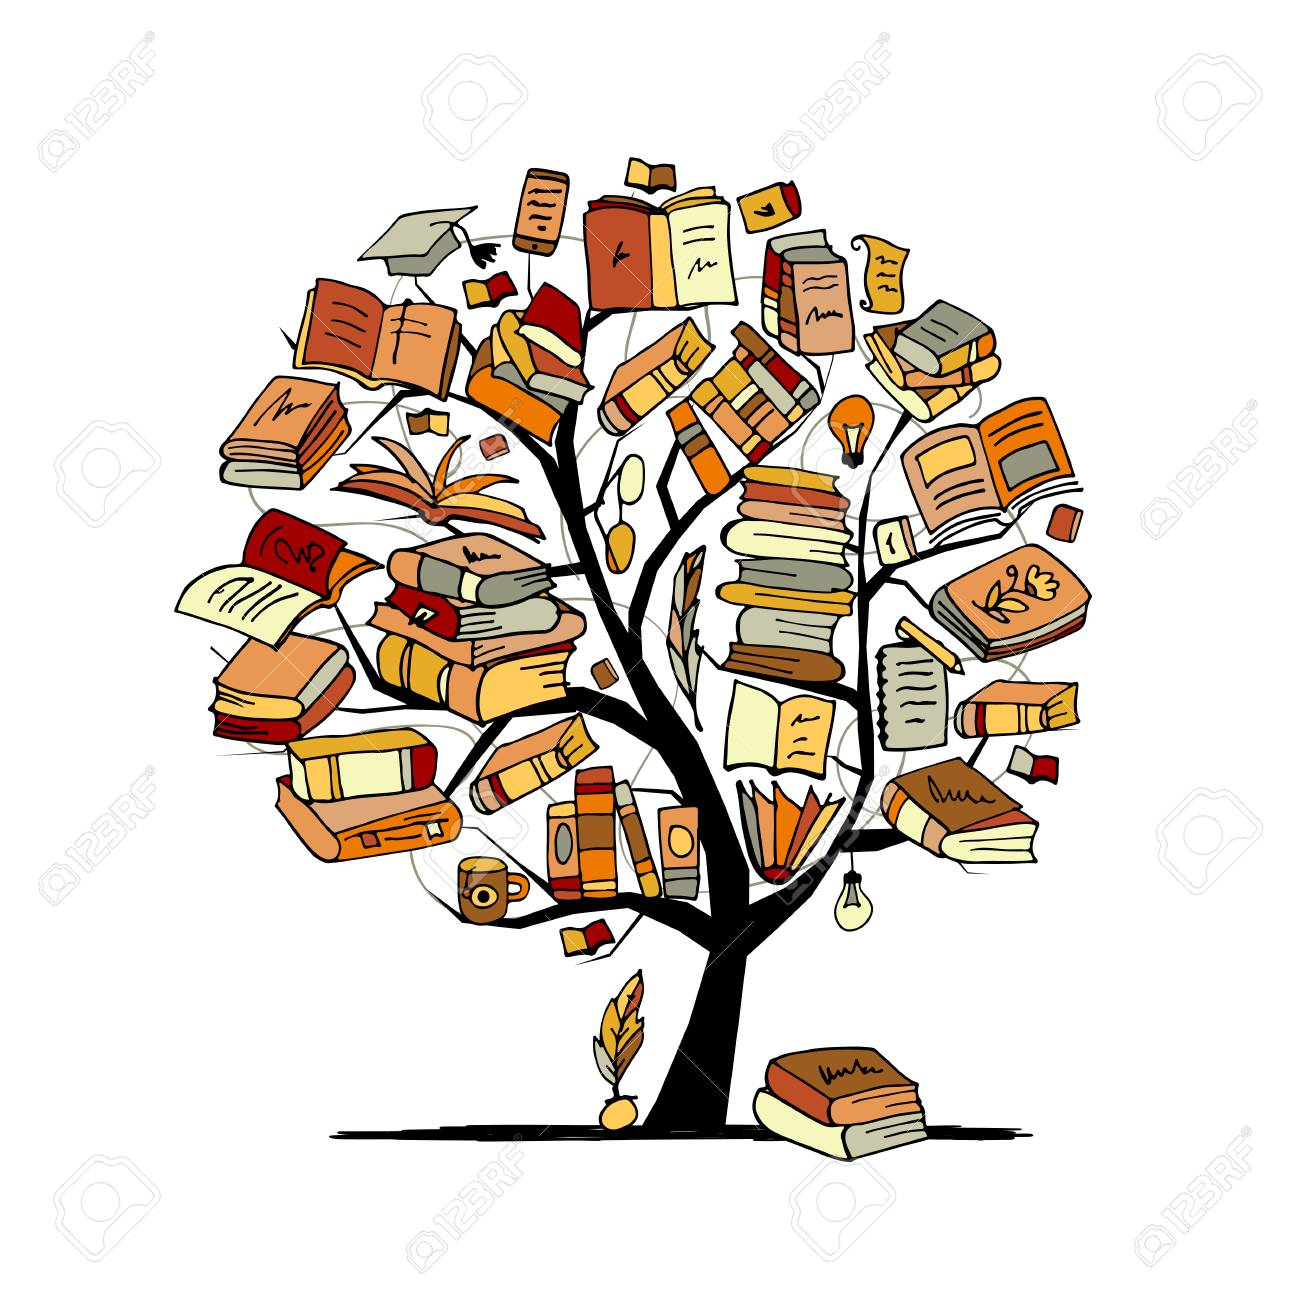 Books tree, sketch for your design. Vector illustration - 84283315